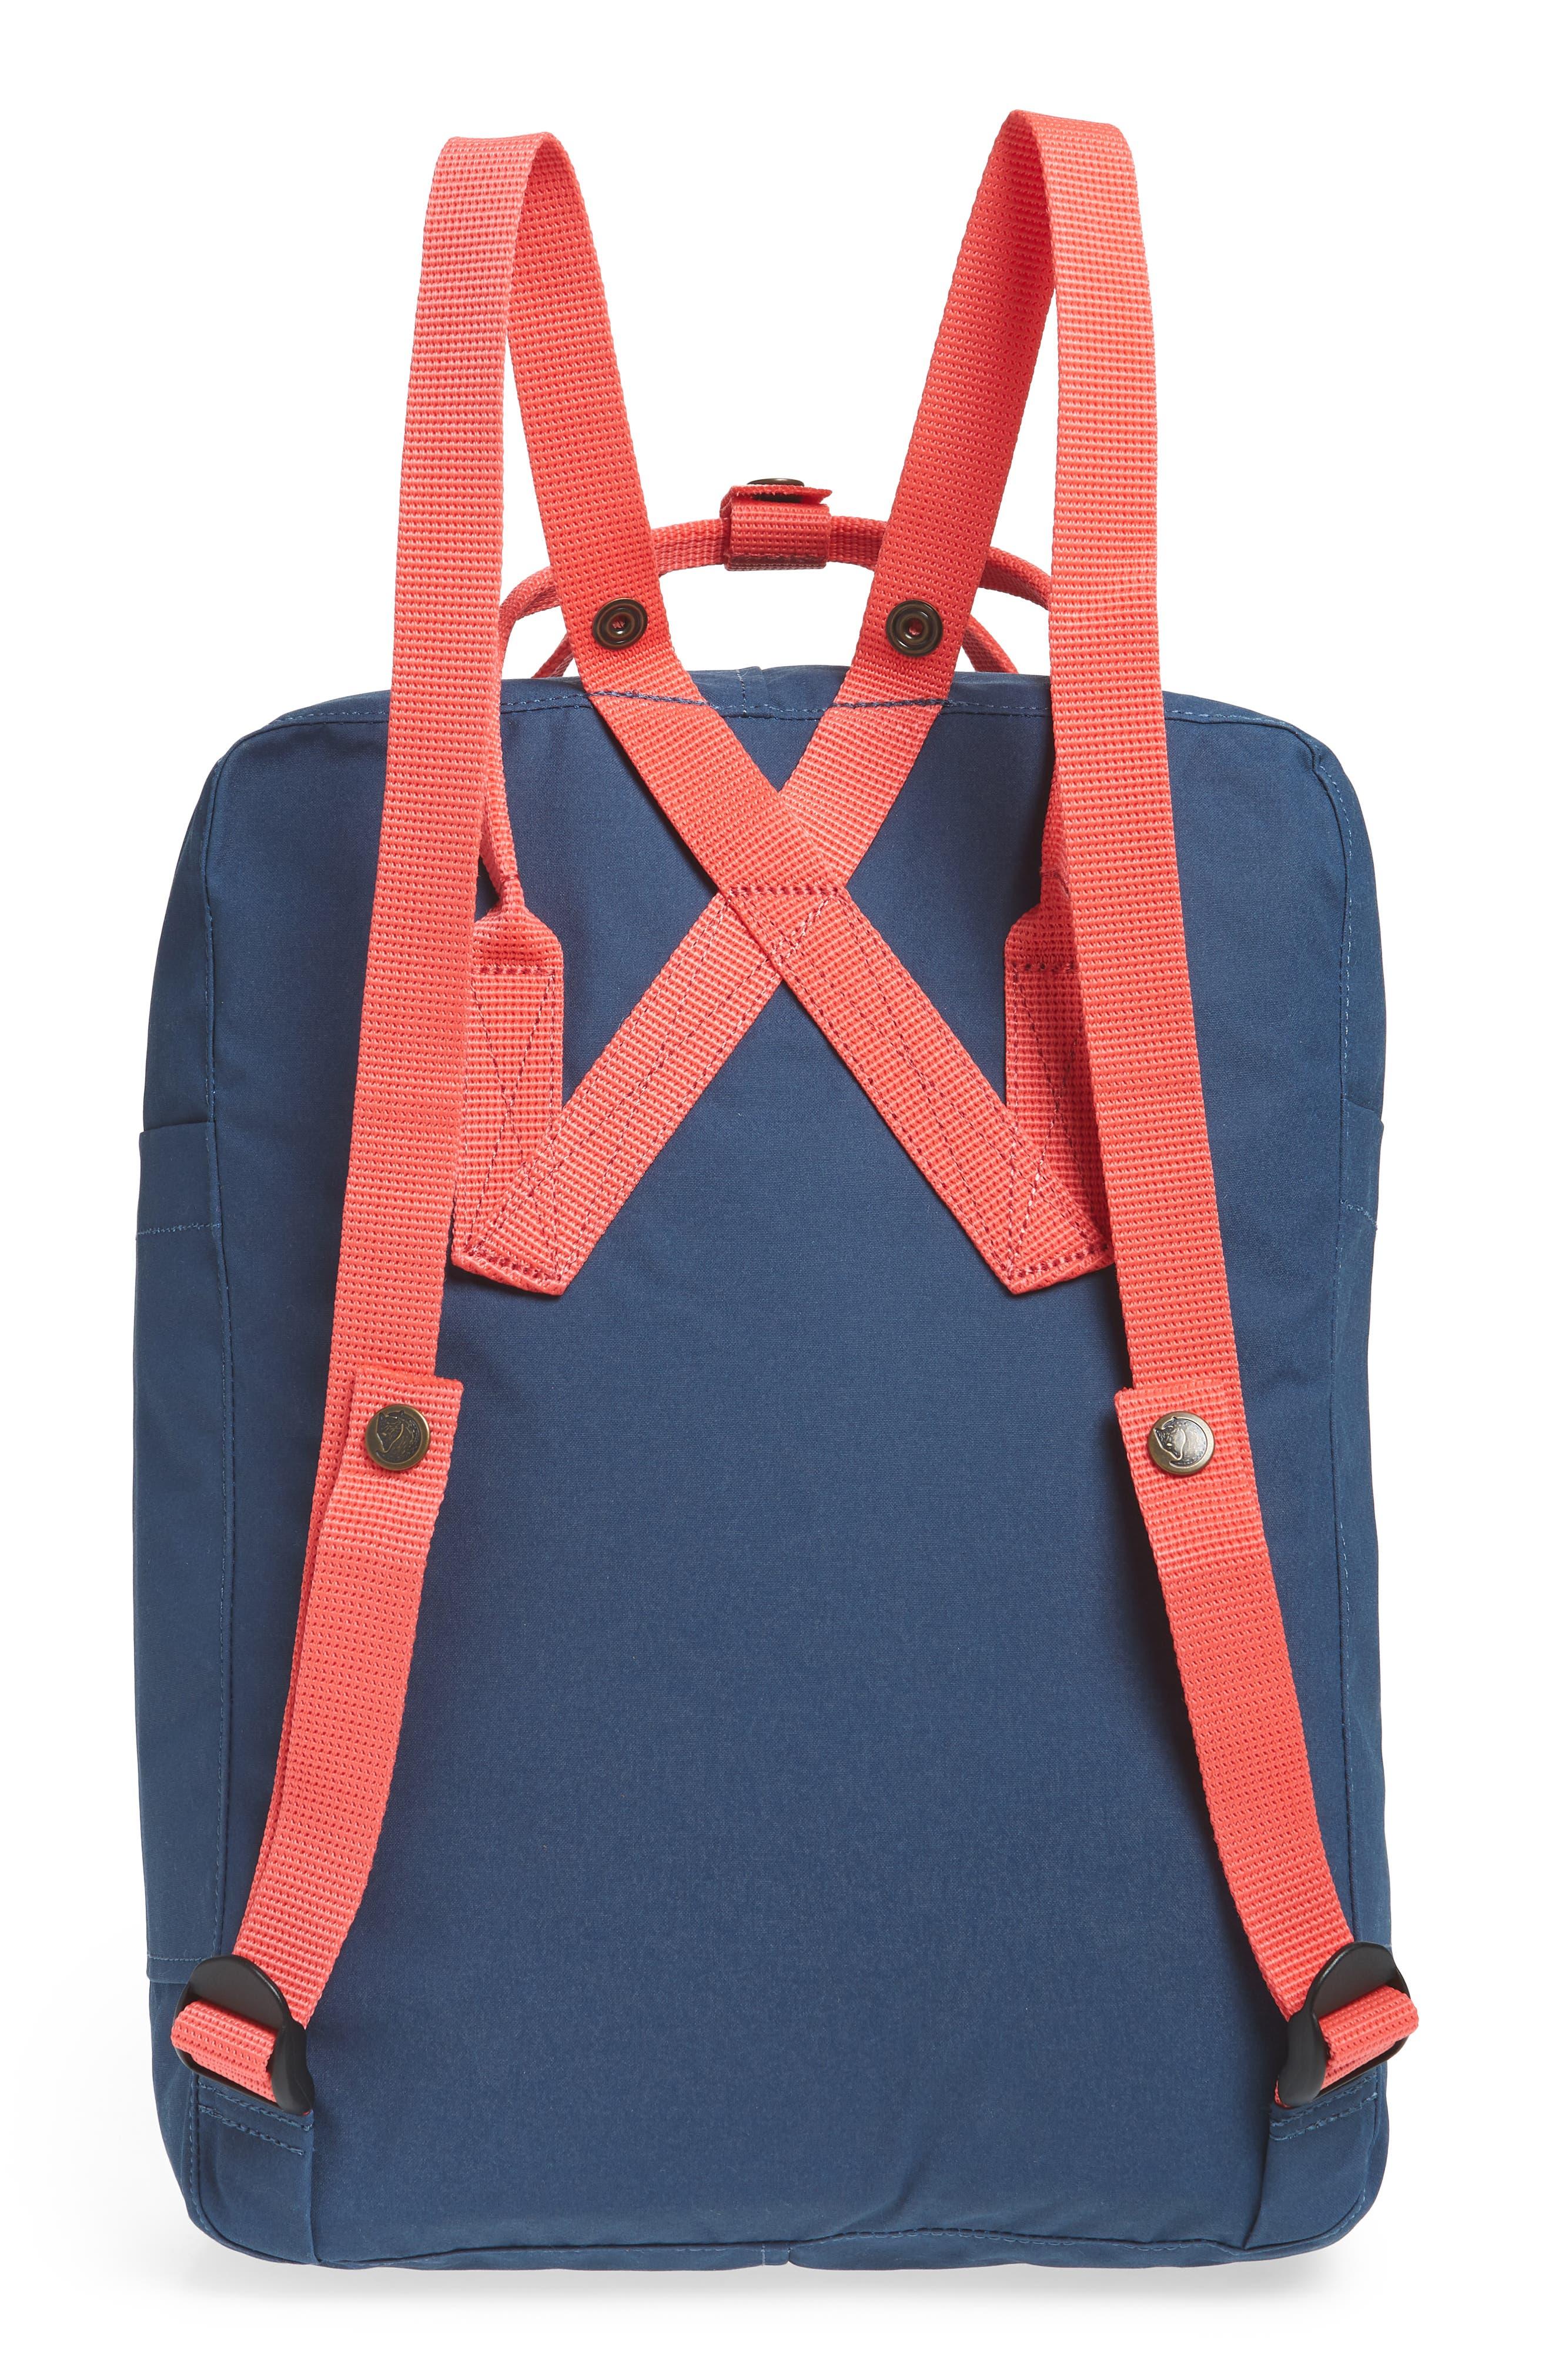 Arctic Fox Kånken Backpack,                             Alternate thumbnail 3, color,                             ROYAL BLUE/ PEACH PINK